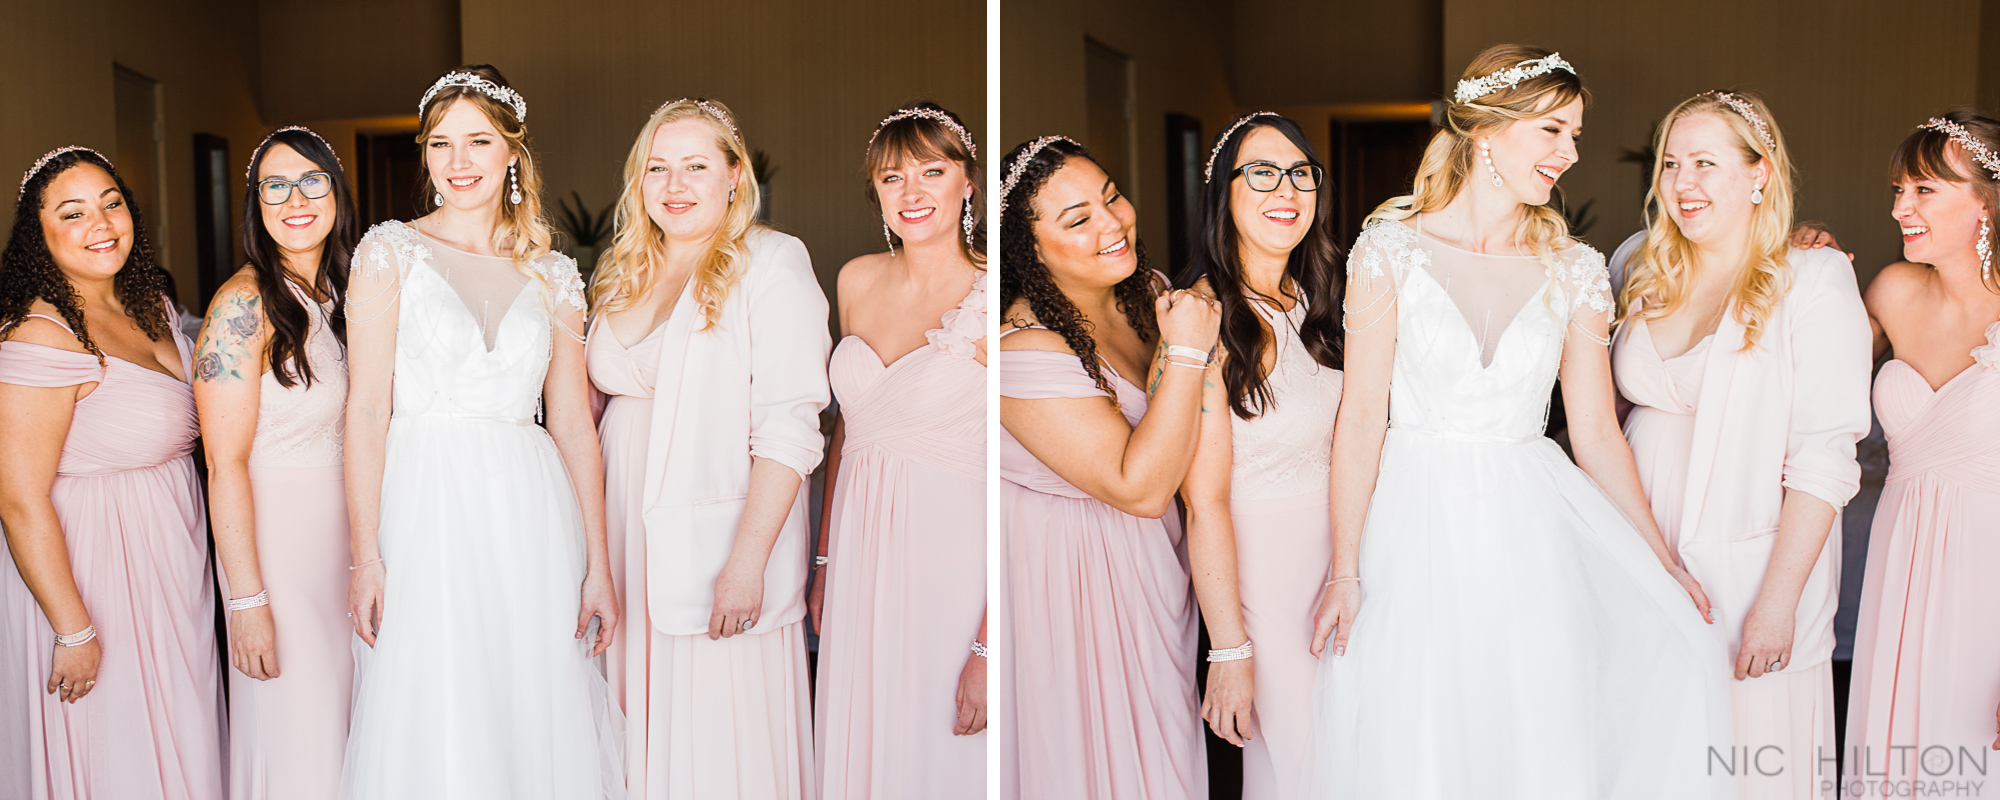 Hotel-Maya-Wedding-Bridesmaids-Prep.jpg